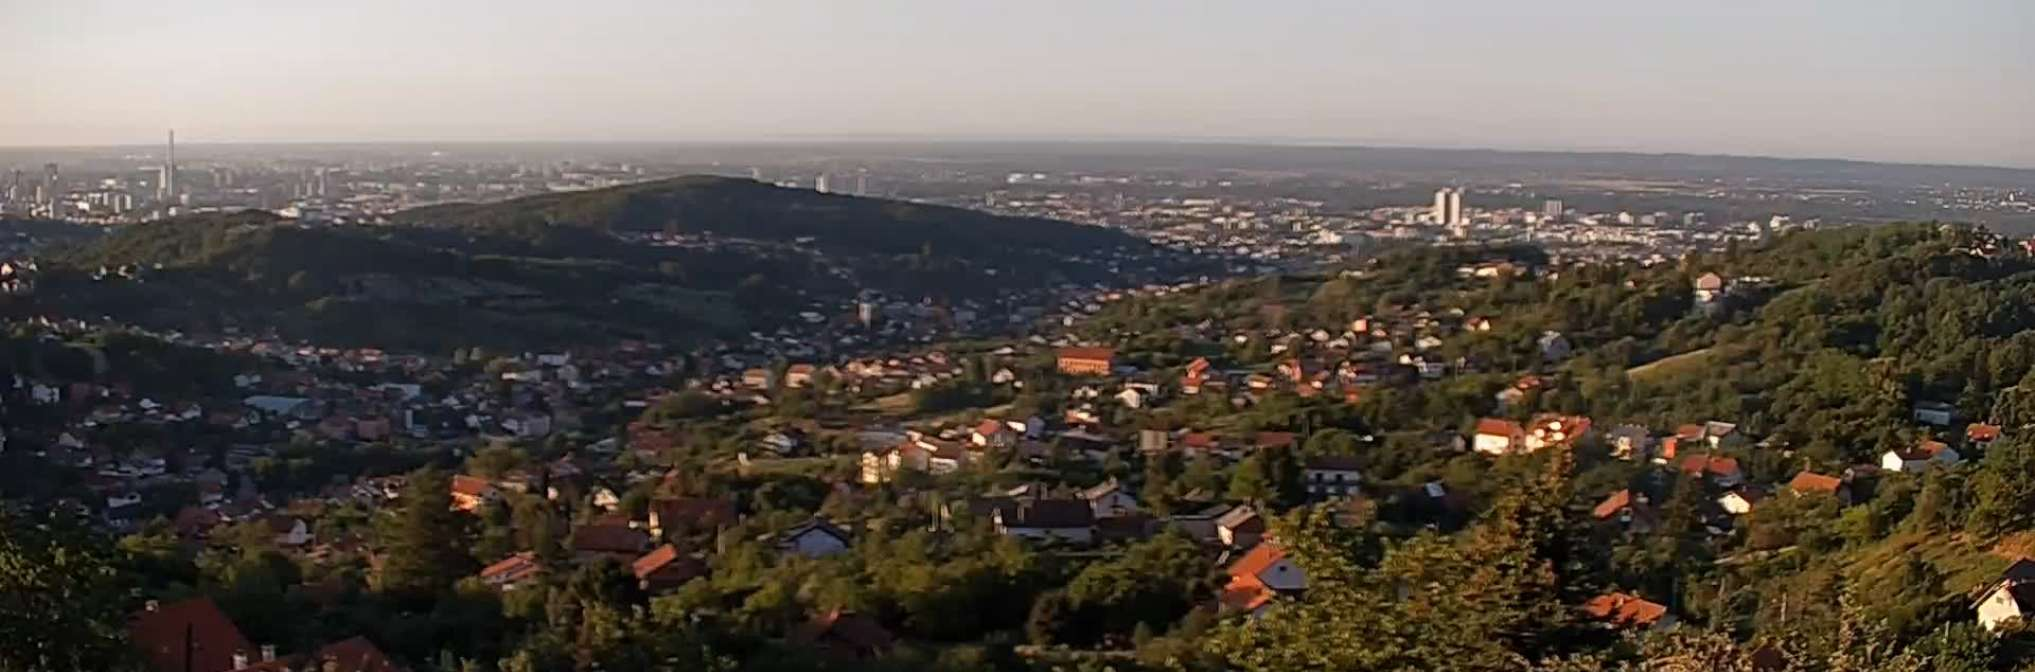 Zagreb Panorama View Vrapce Zagreb Right Now Live Livestreaming Cameras From Croatia Livecamcroatia Explore Croatia